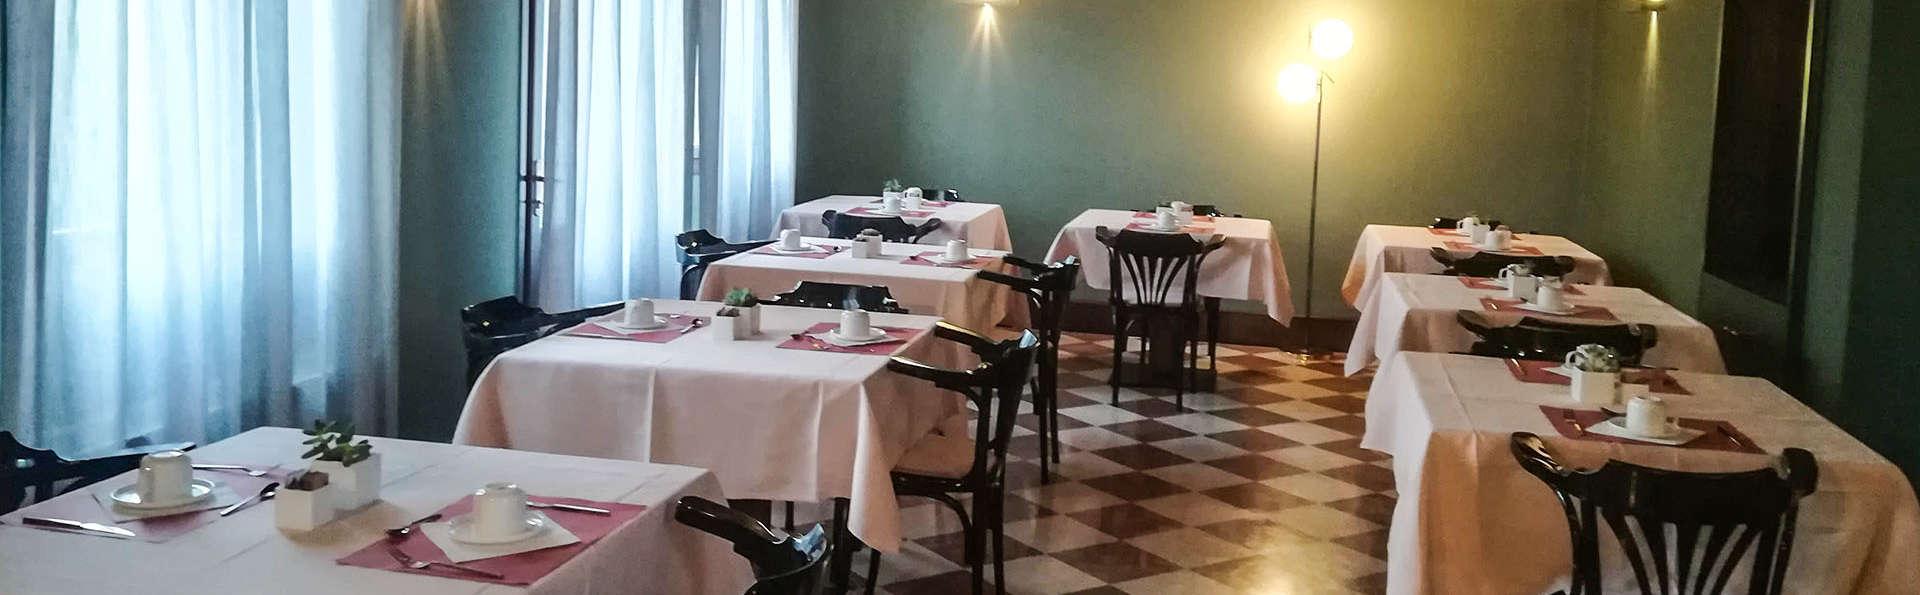 Hotel Scala - EDIT_RESTAURANT_03.jpg